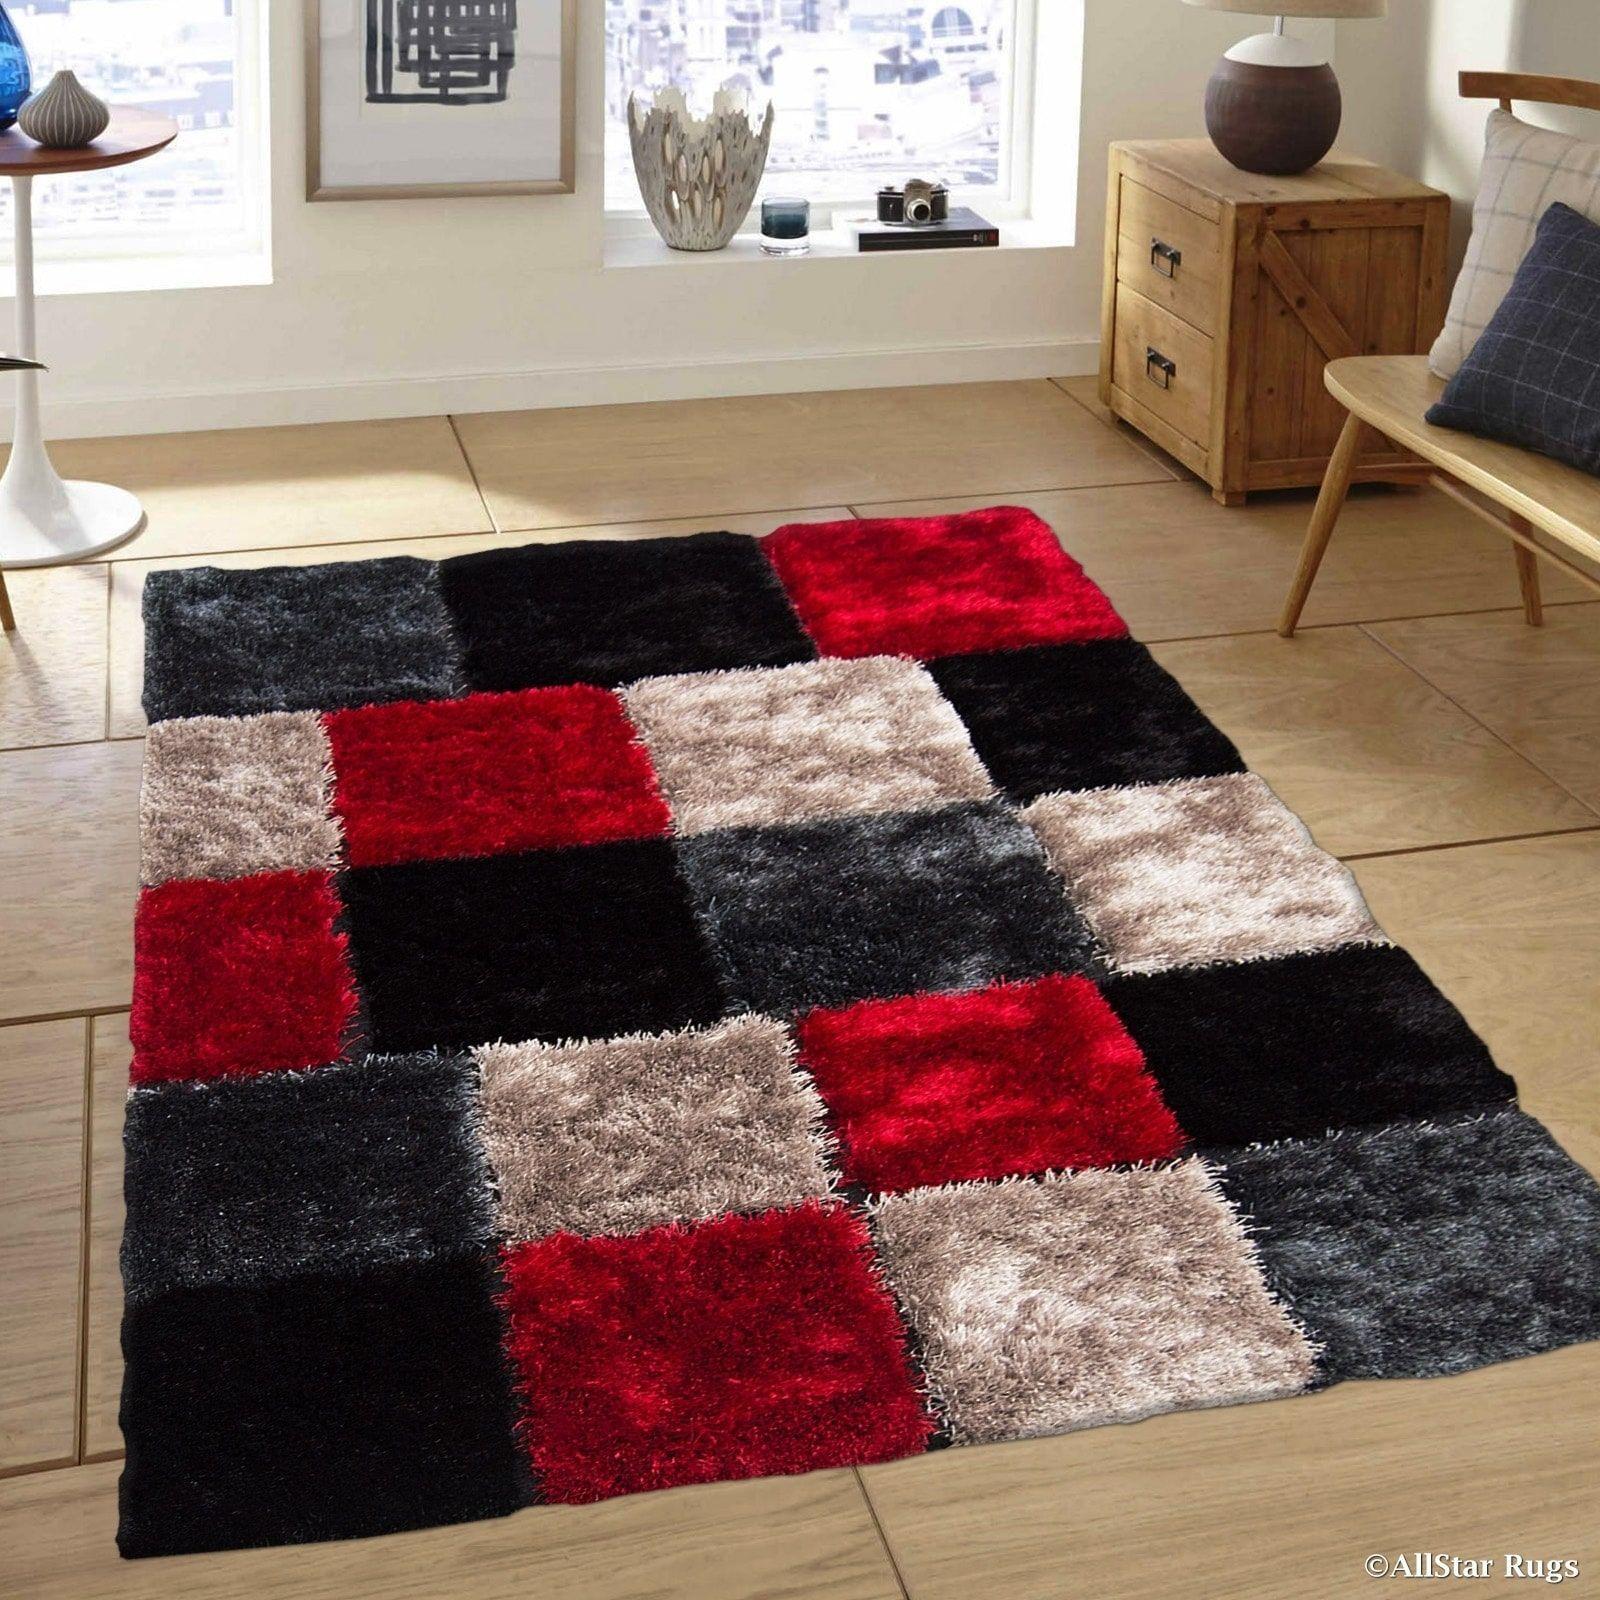 Cotton Lattice Area Rug Carpet Indoor Outdoor Rugs Woven Washable Rugs Buffalo Lattice Rug Retro Doormat Kitchen Mat White Rug In 2020 Red Living Room Decor Black Living Room Decor Living